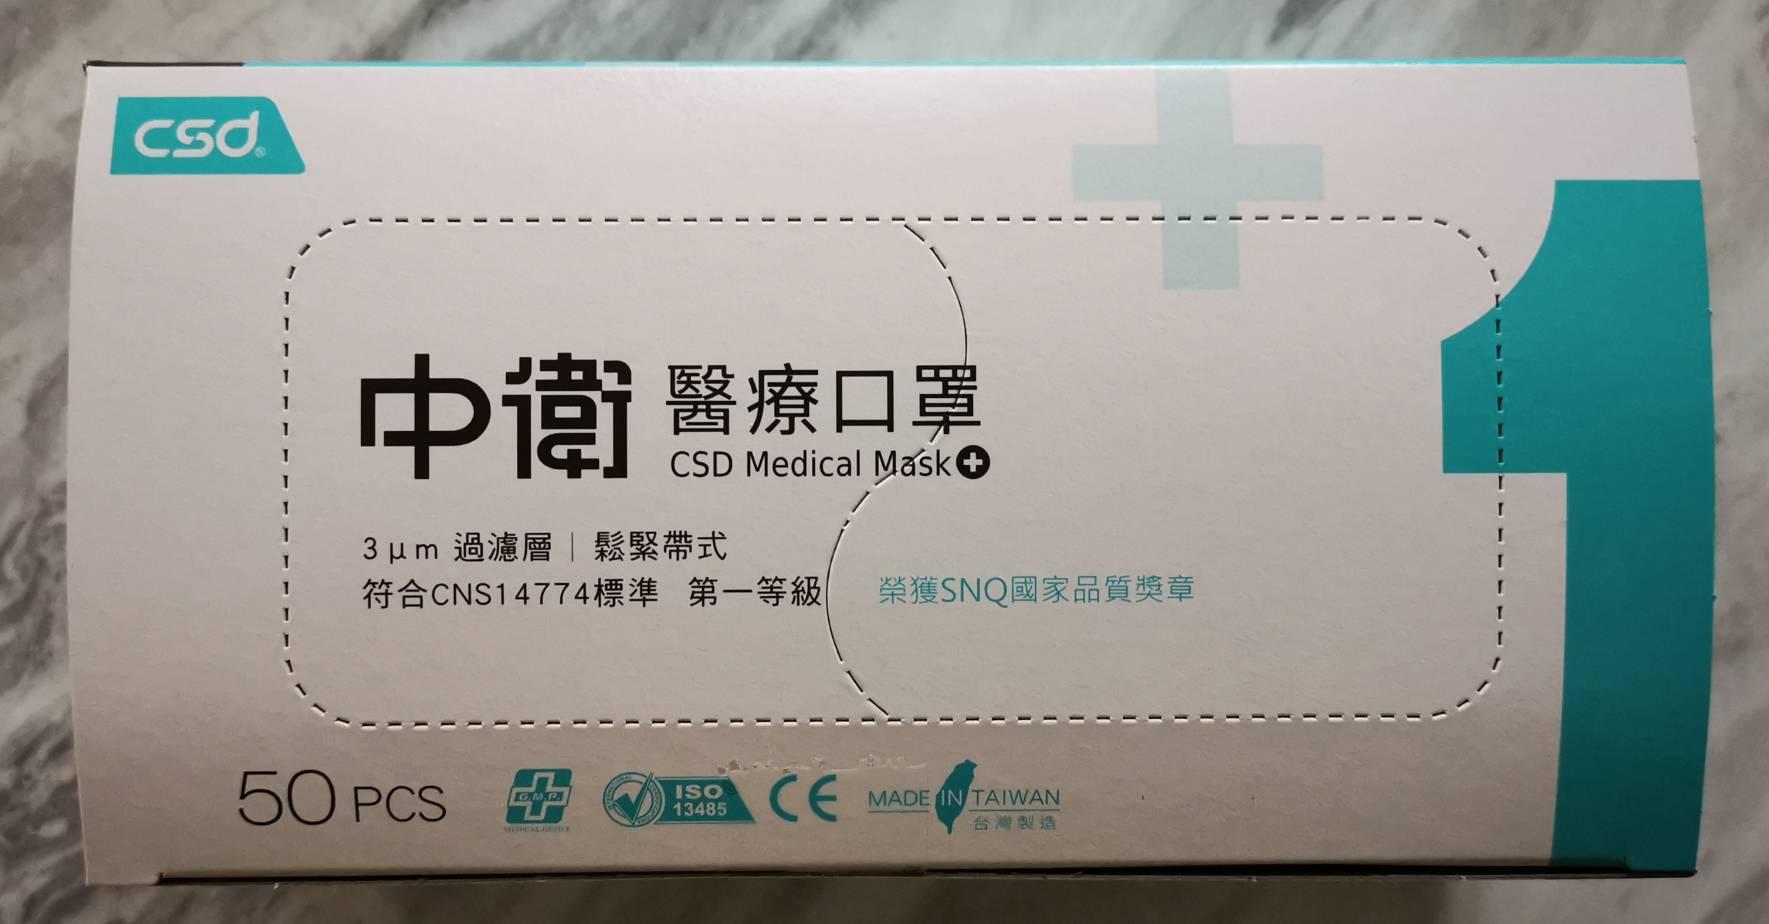 CSD中衛 第一等級醫療口罩-50入/盒裝 藍色/綠色 雙鋼印-HAPPY GOD 保健美食生活館